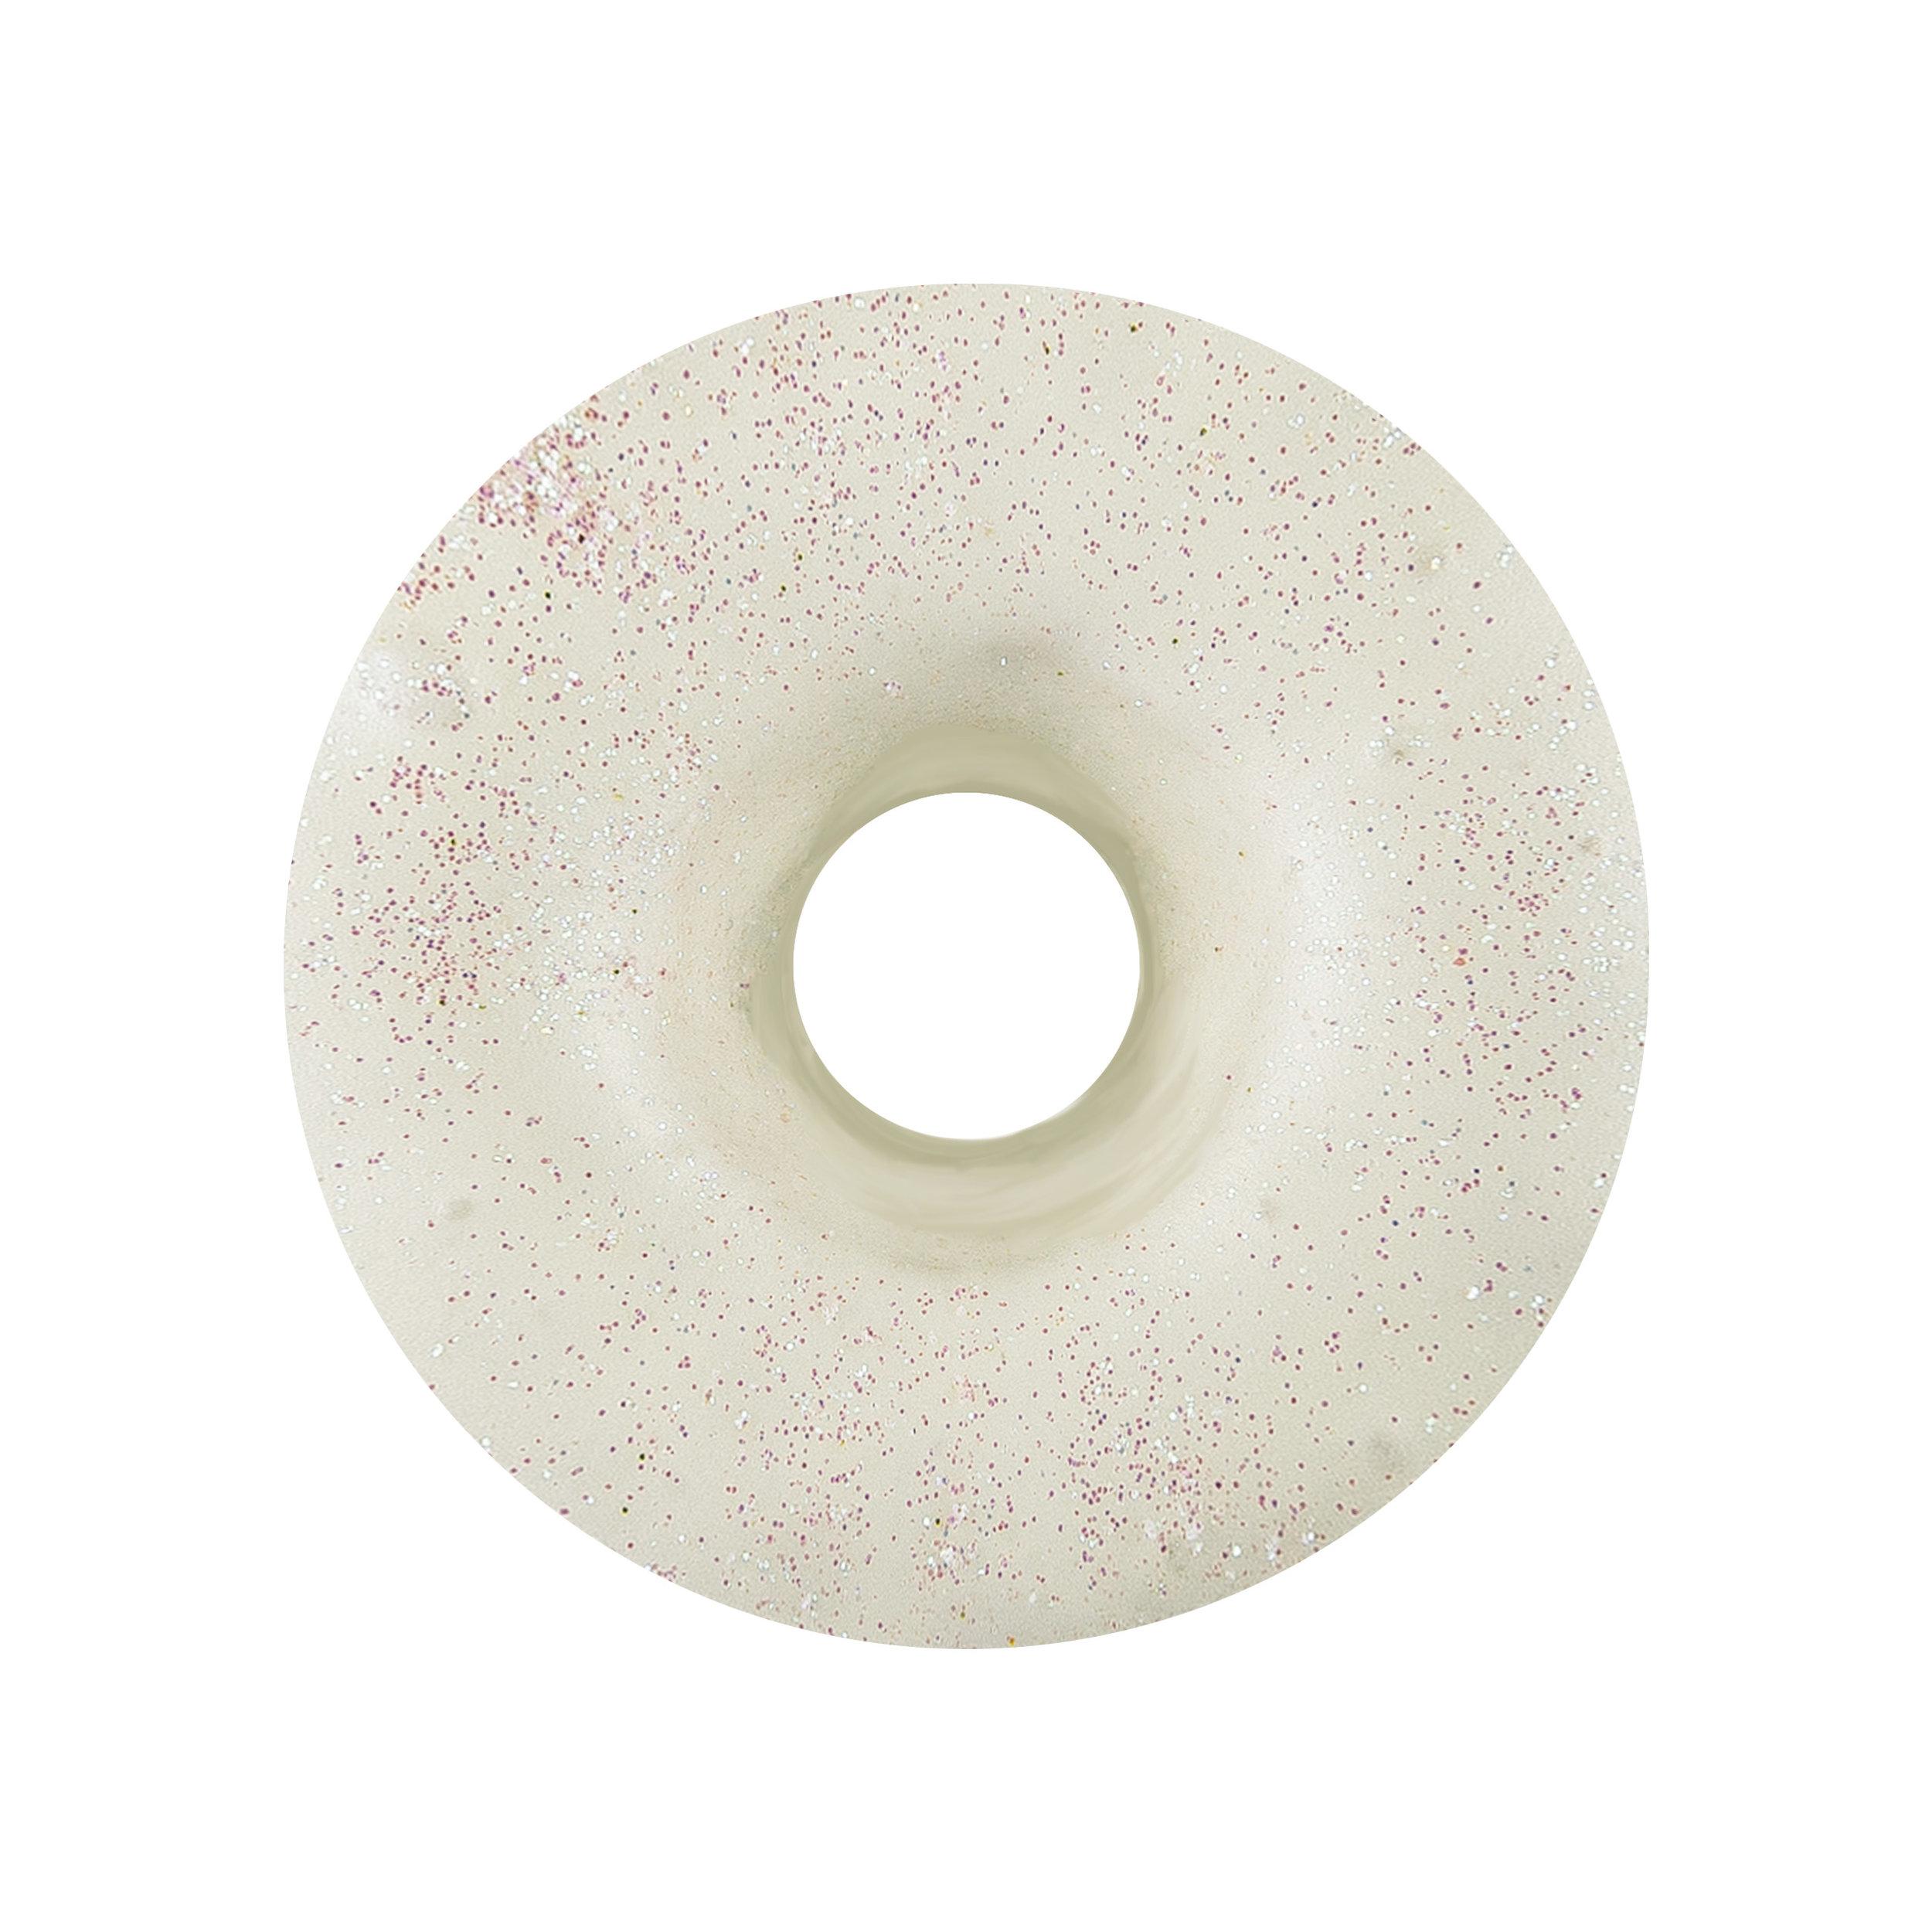 IRIDESCENT - WHITE CHOCOLATE GLAZE + SPRINKLES